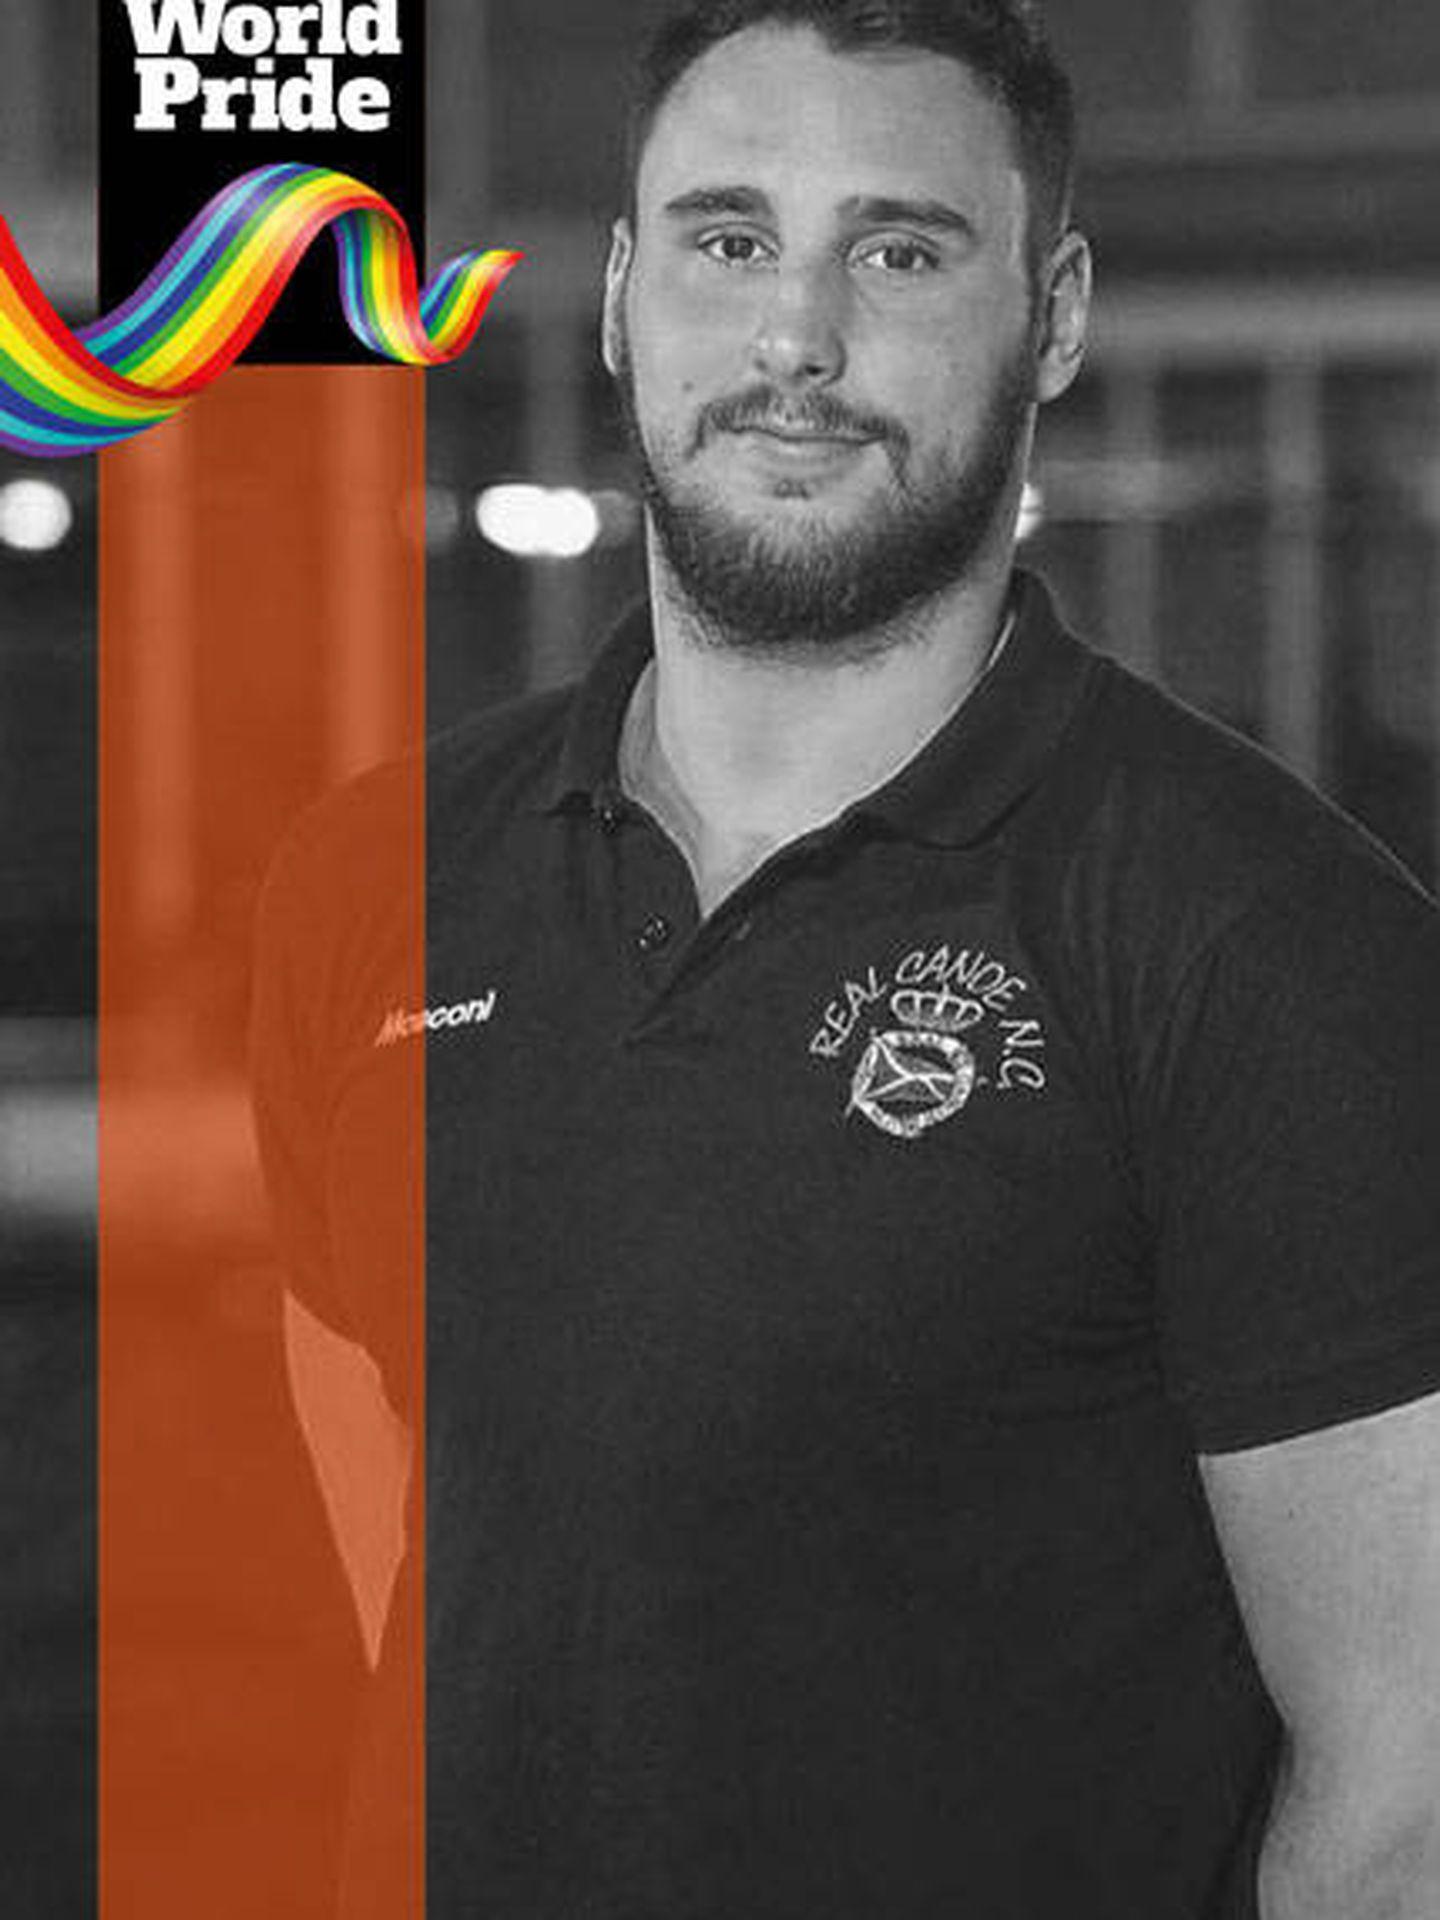 Orgullo LGTBI 2017: Víctor Gutiérrez.